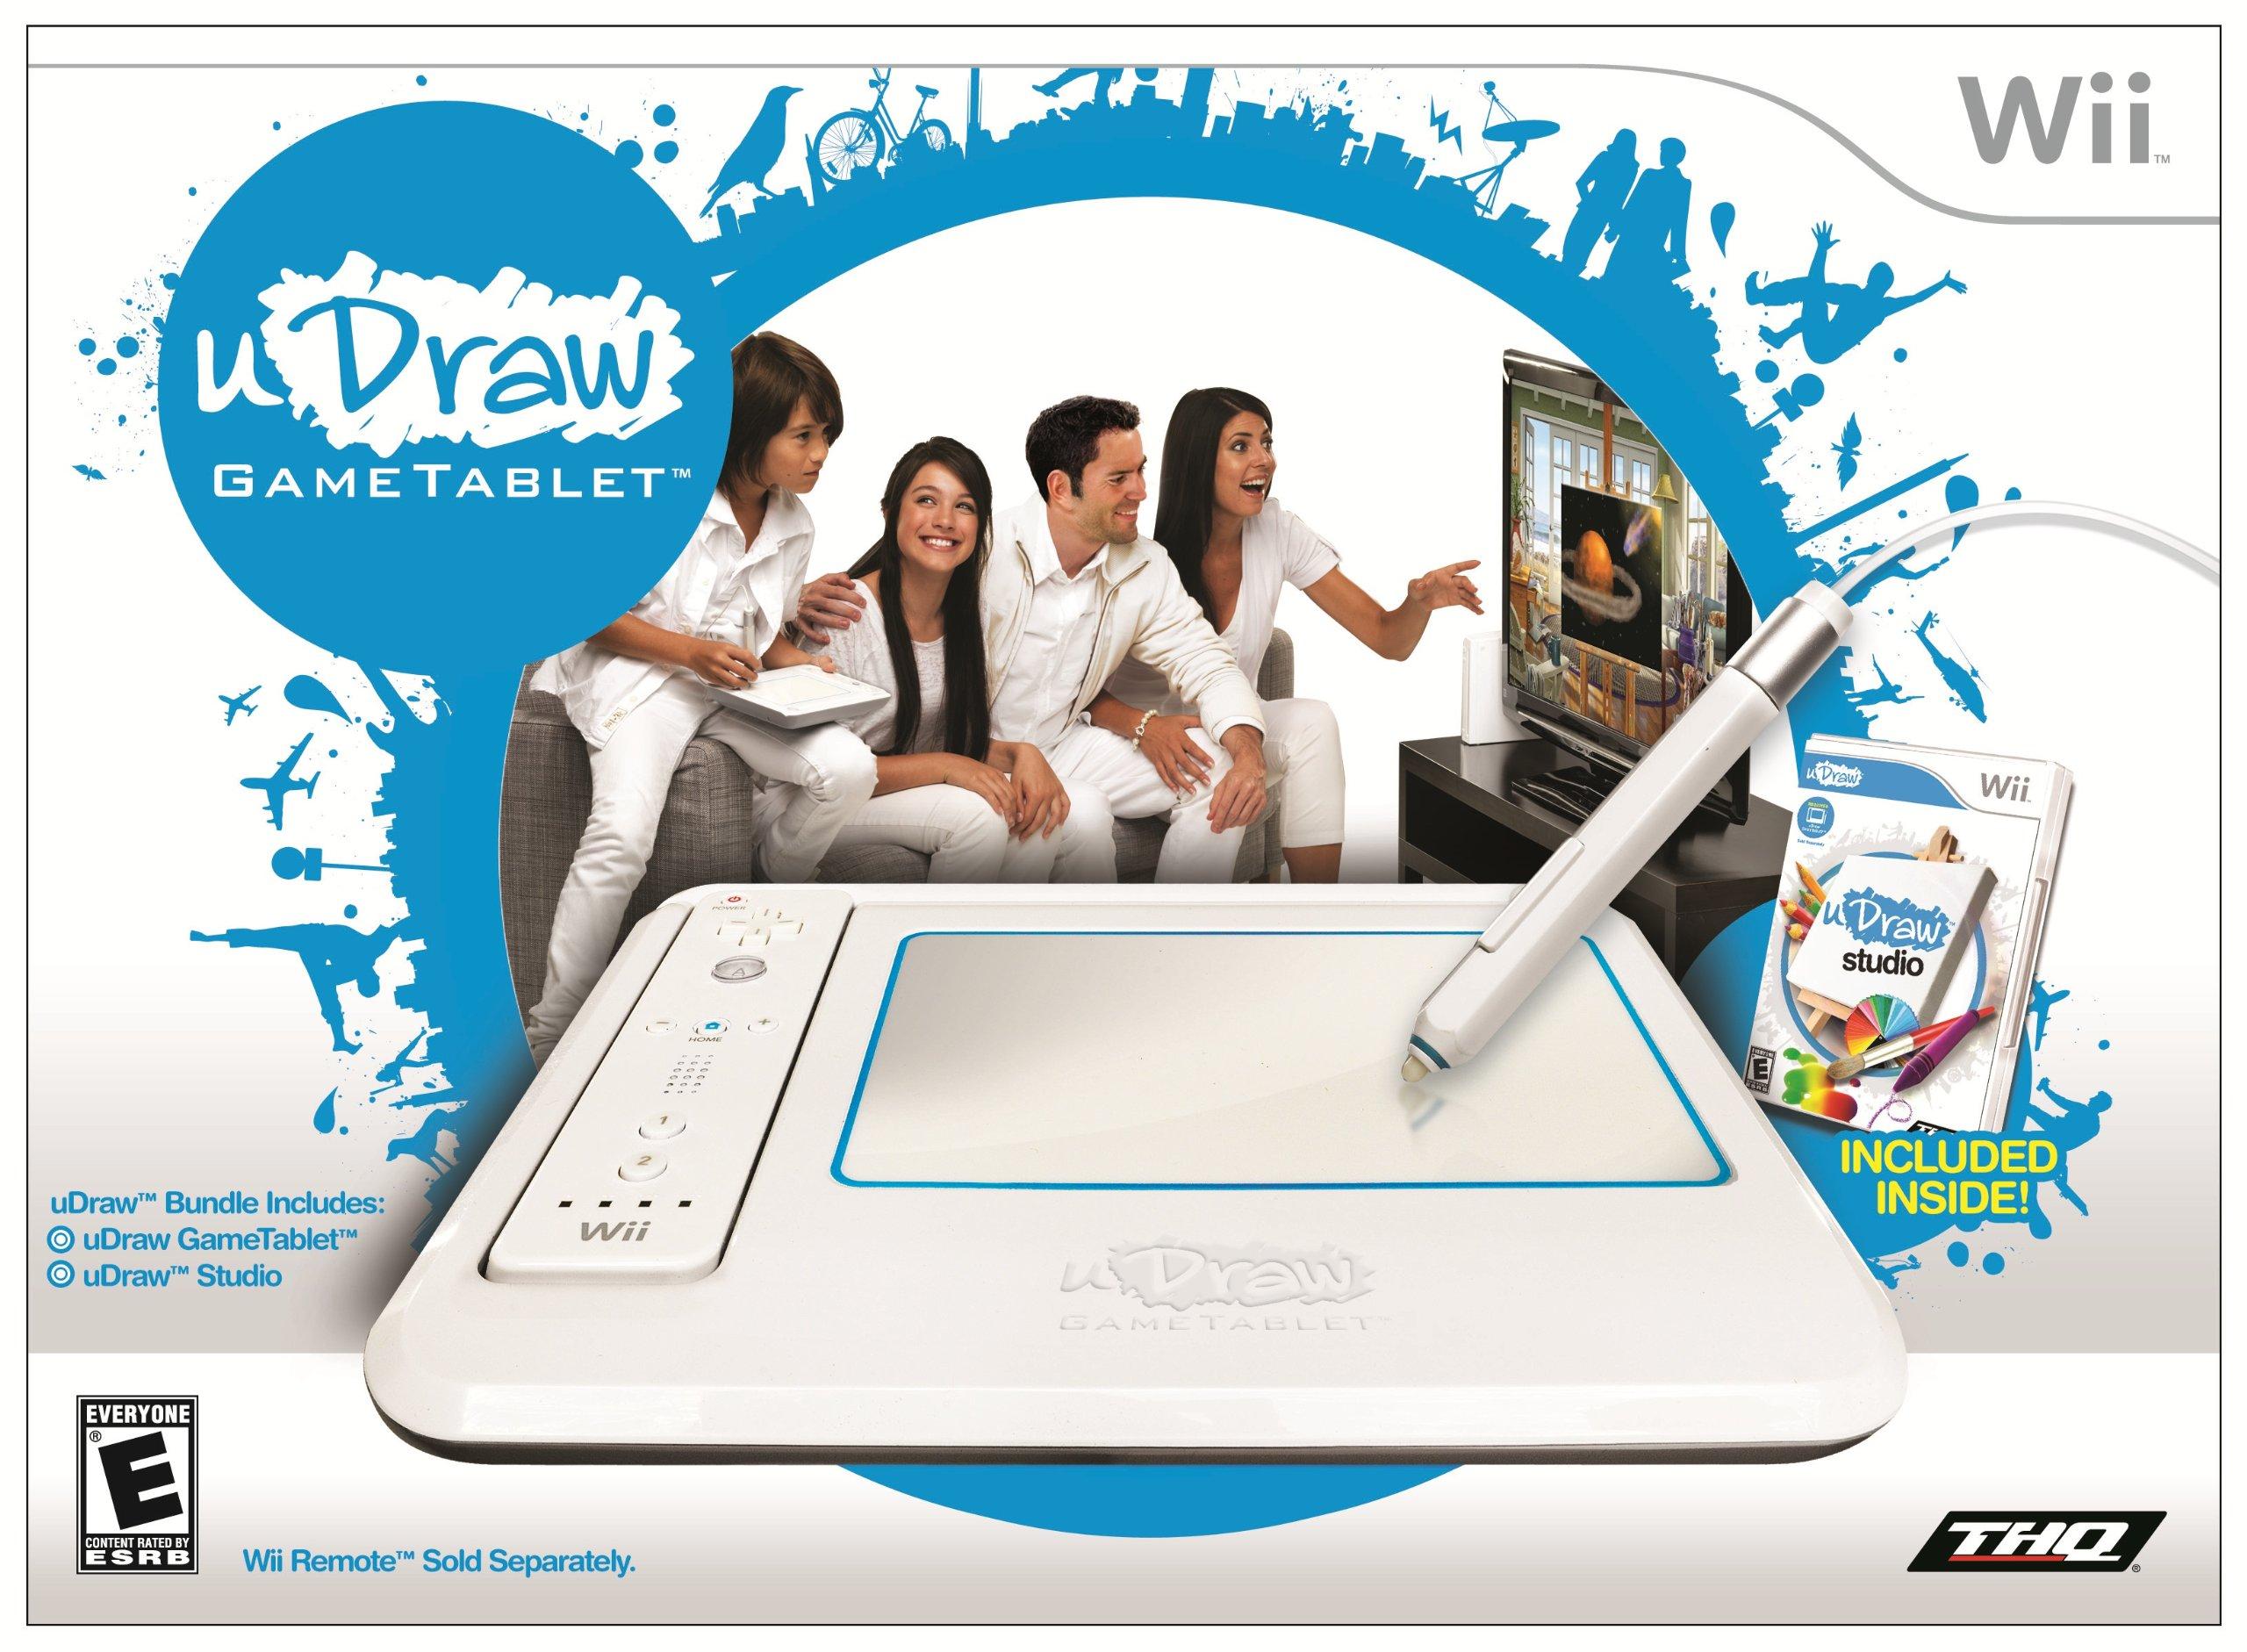 uDraw GameTablet with uDraw Studio - Nintendo Wii